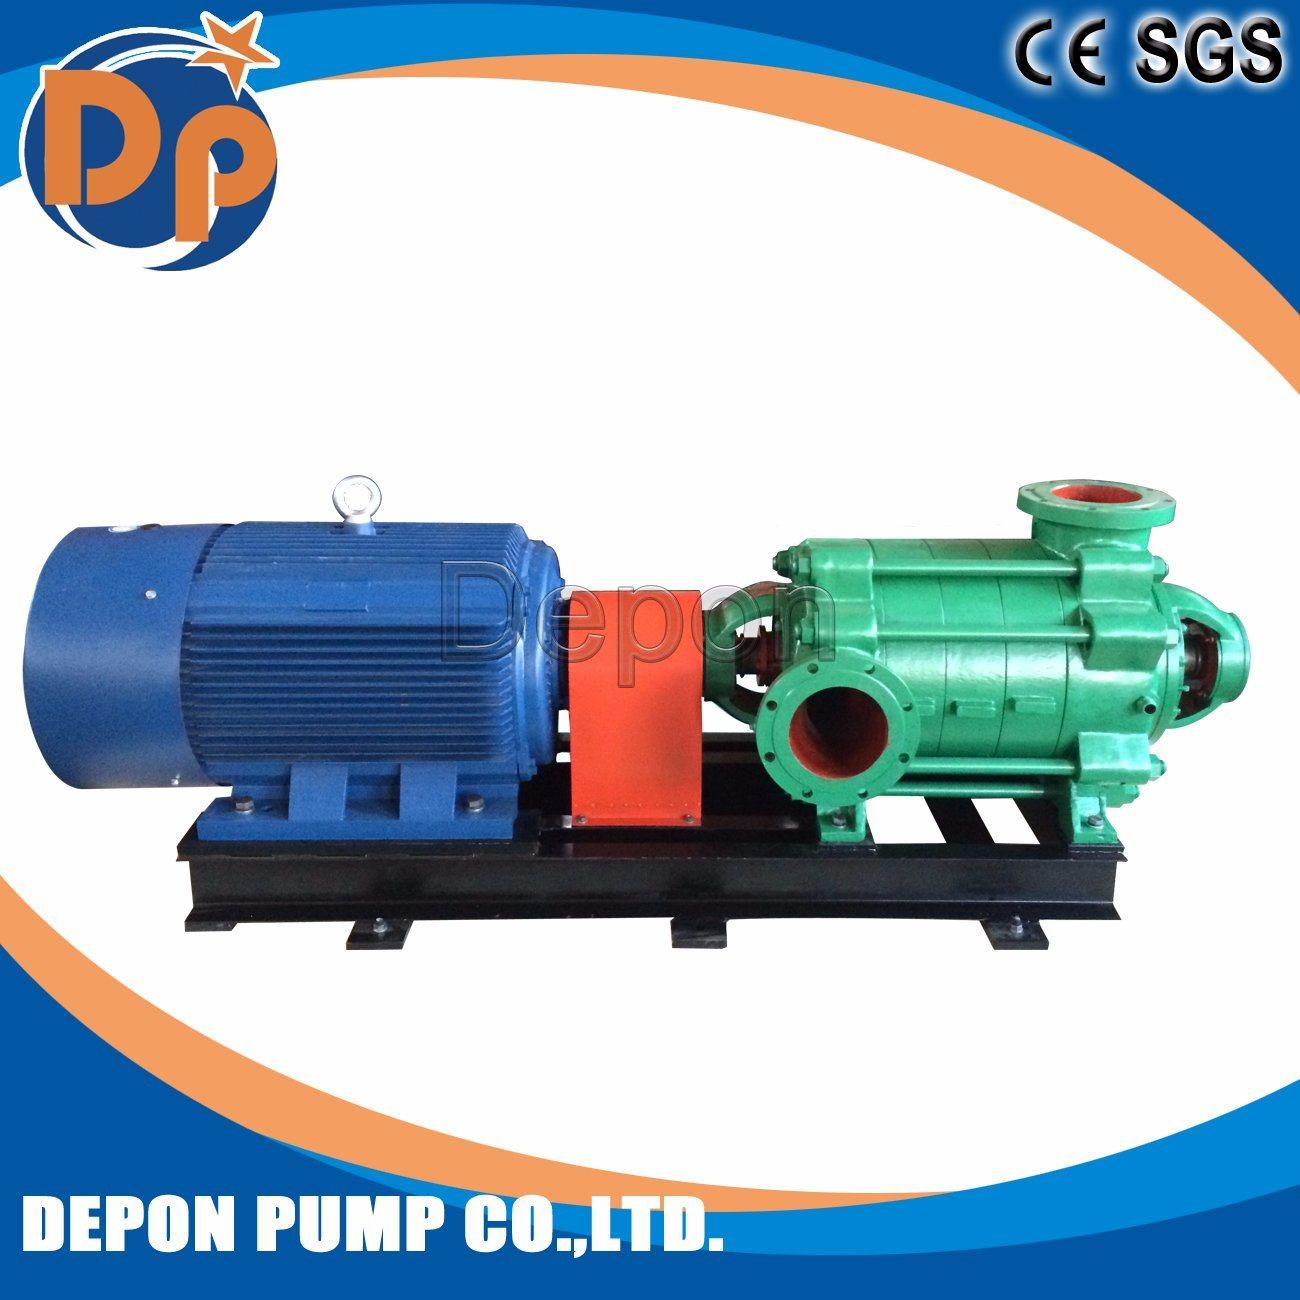 Marine Horizontal Electric Mining Centrifugal Pump Supplier